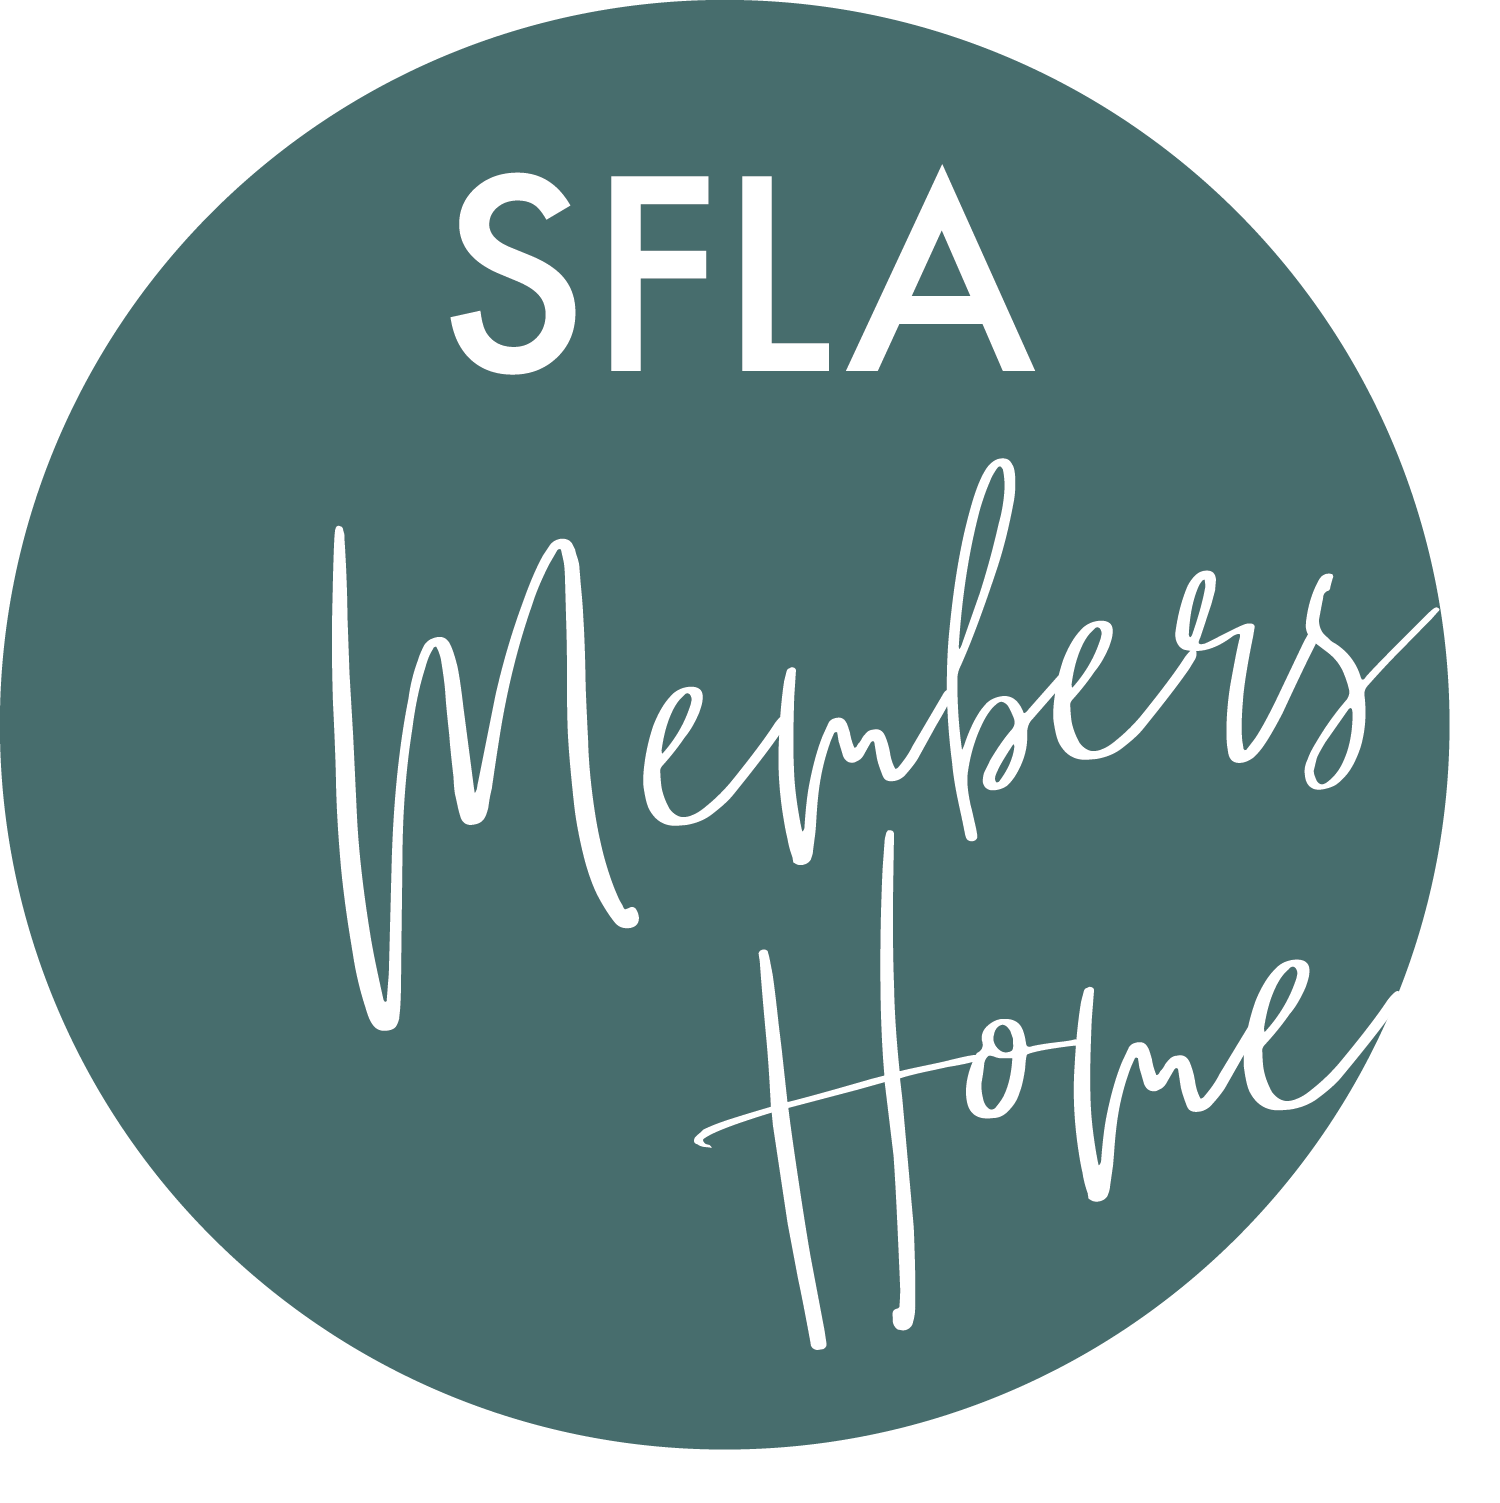 sfla home_1.png